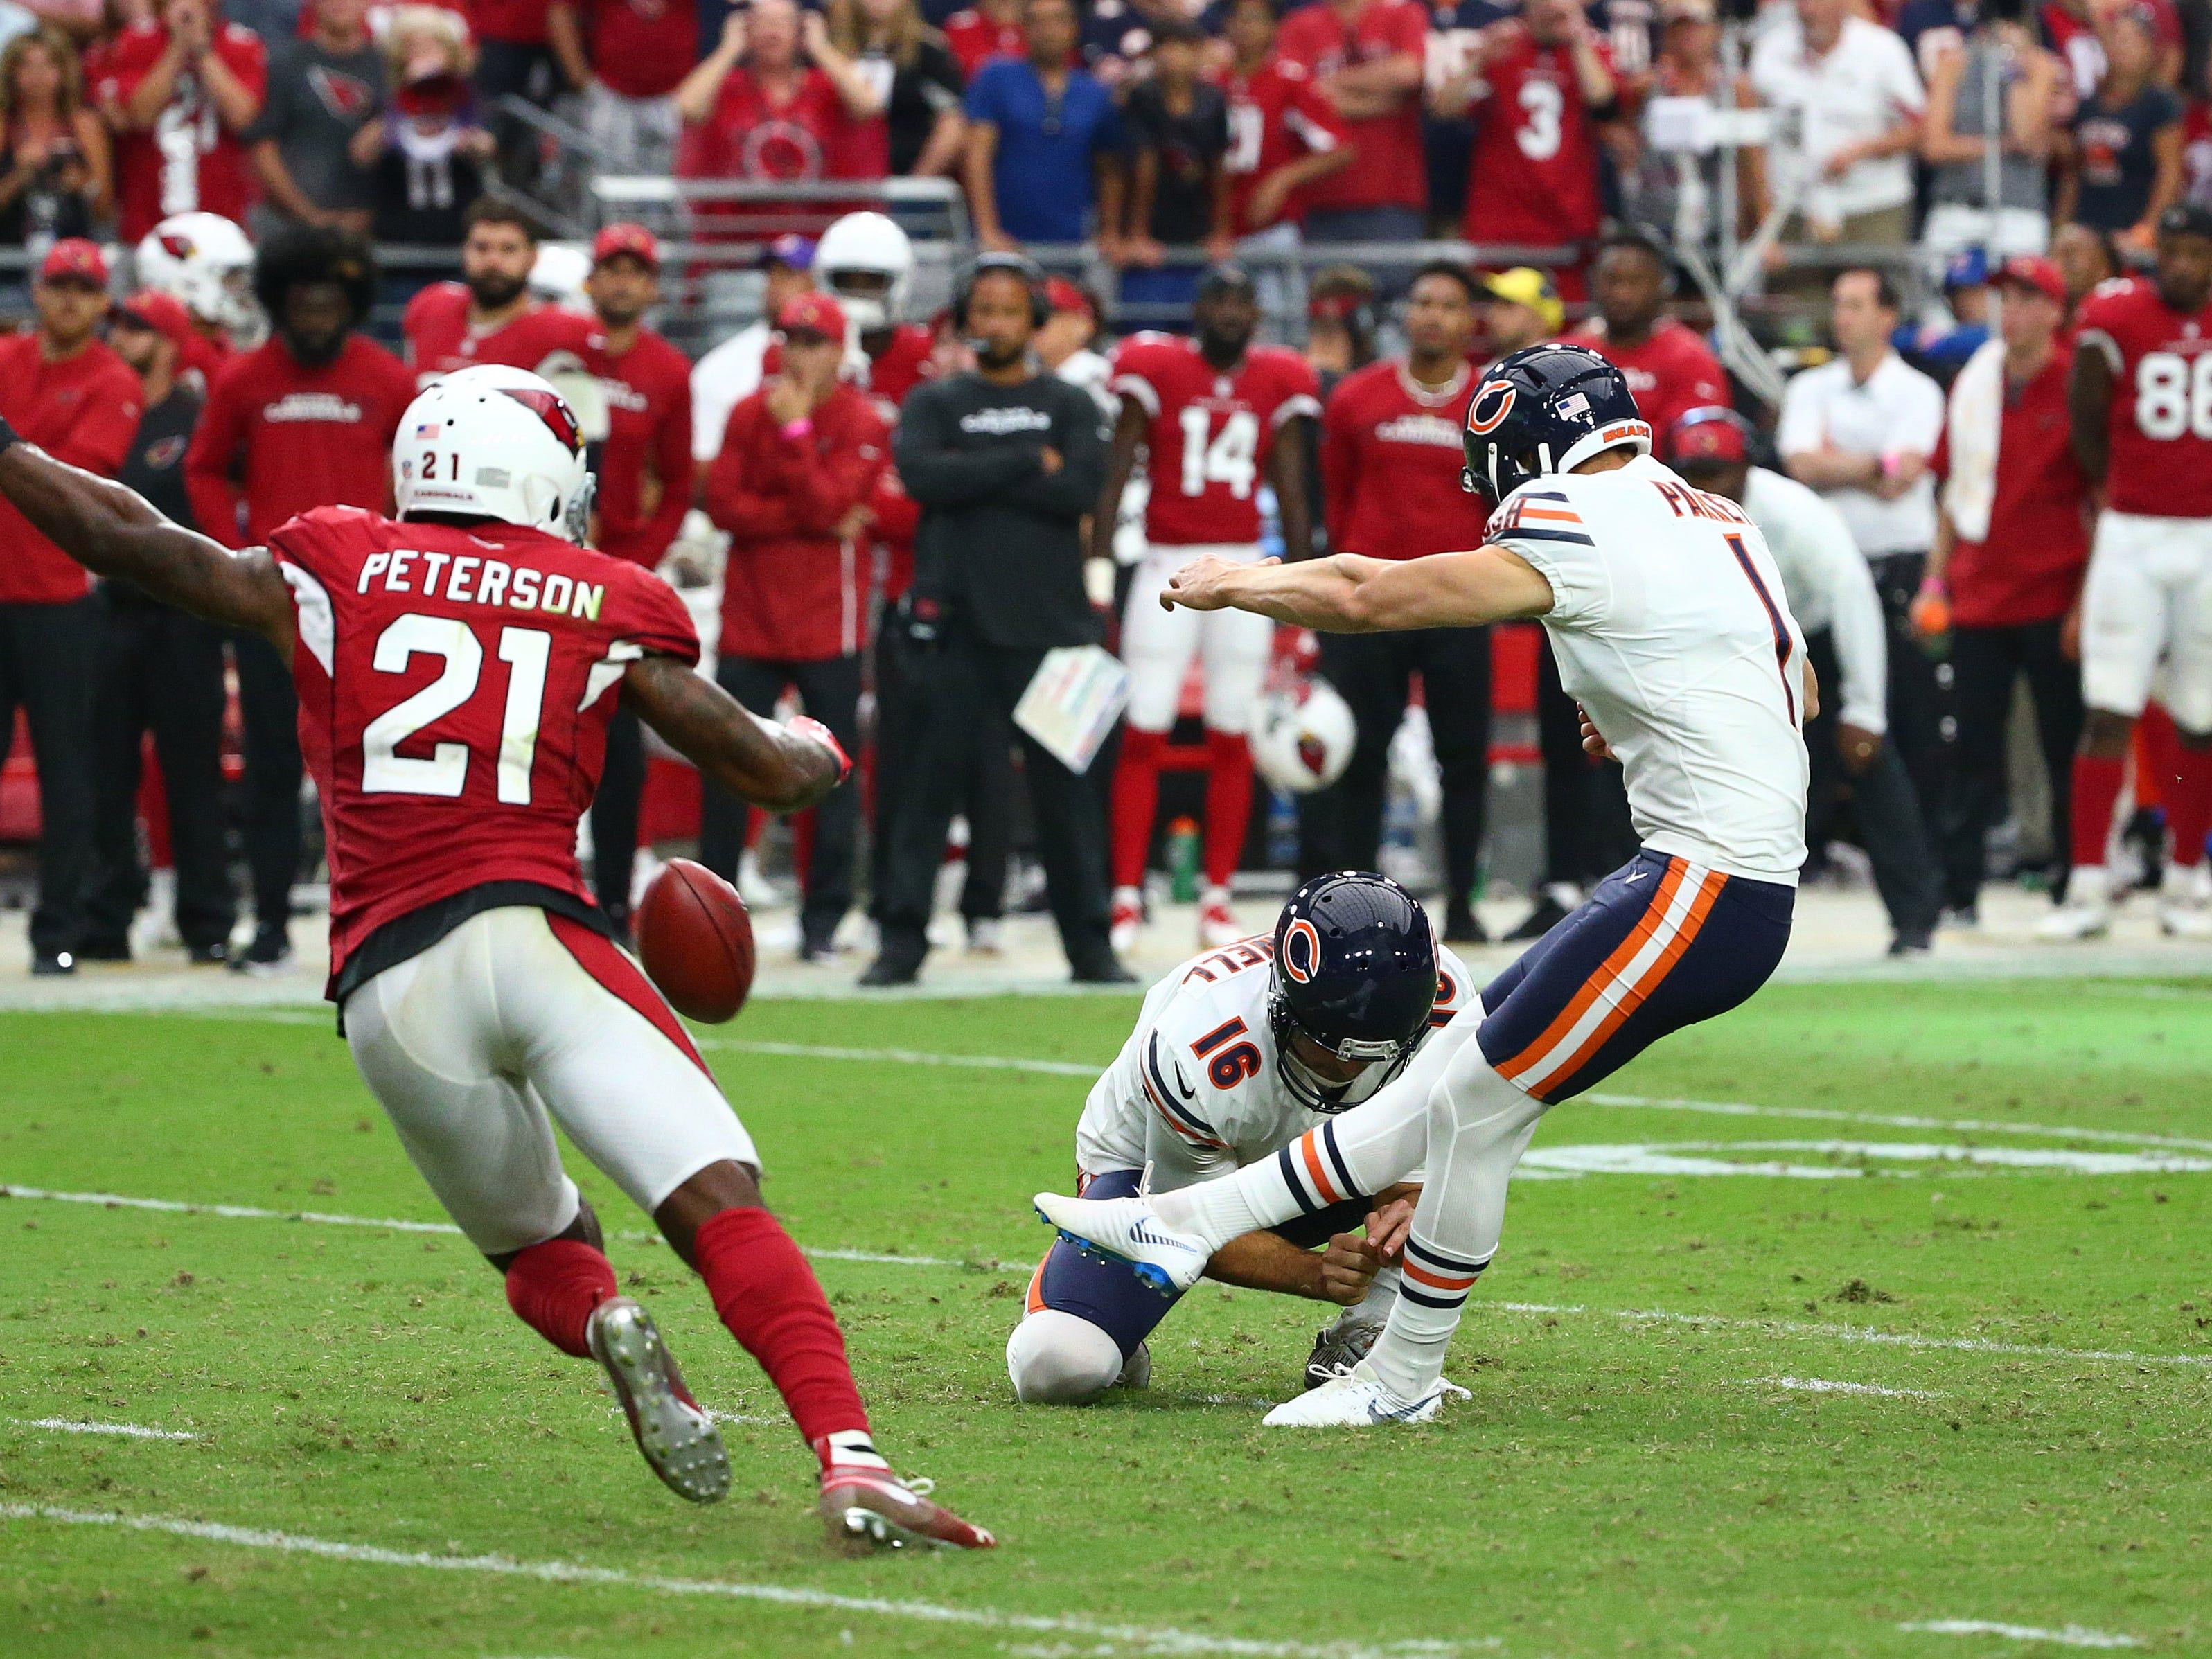 Chicago Bears Cody Parkey kicks the winning field goal against the Arizona Cardinals in the second half at State Farm Stadium in Glendale, Ariz.